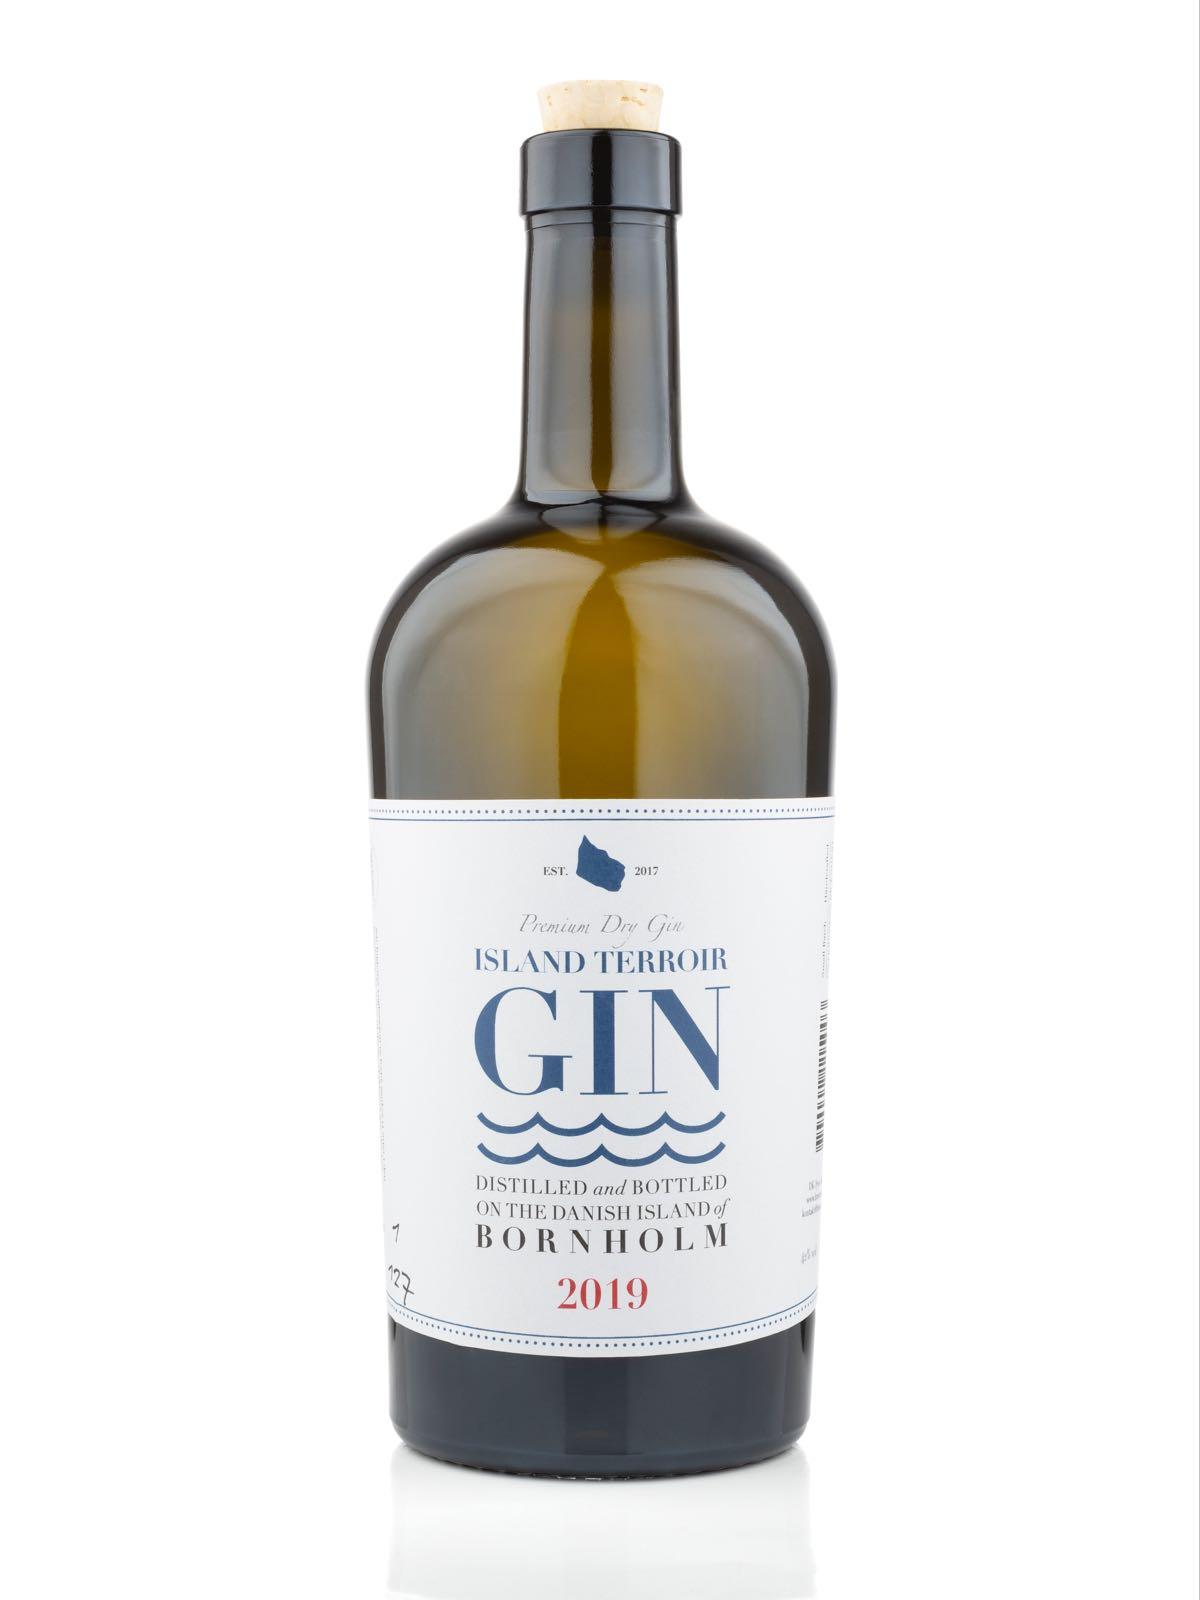 Island Terroir Gin 2019